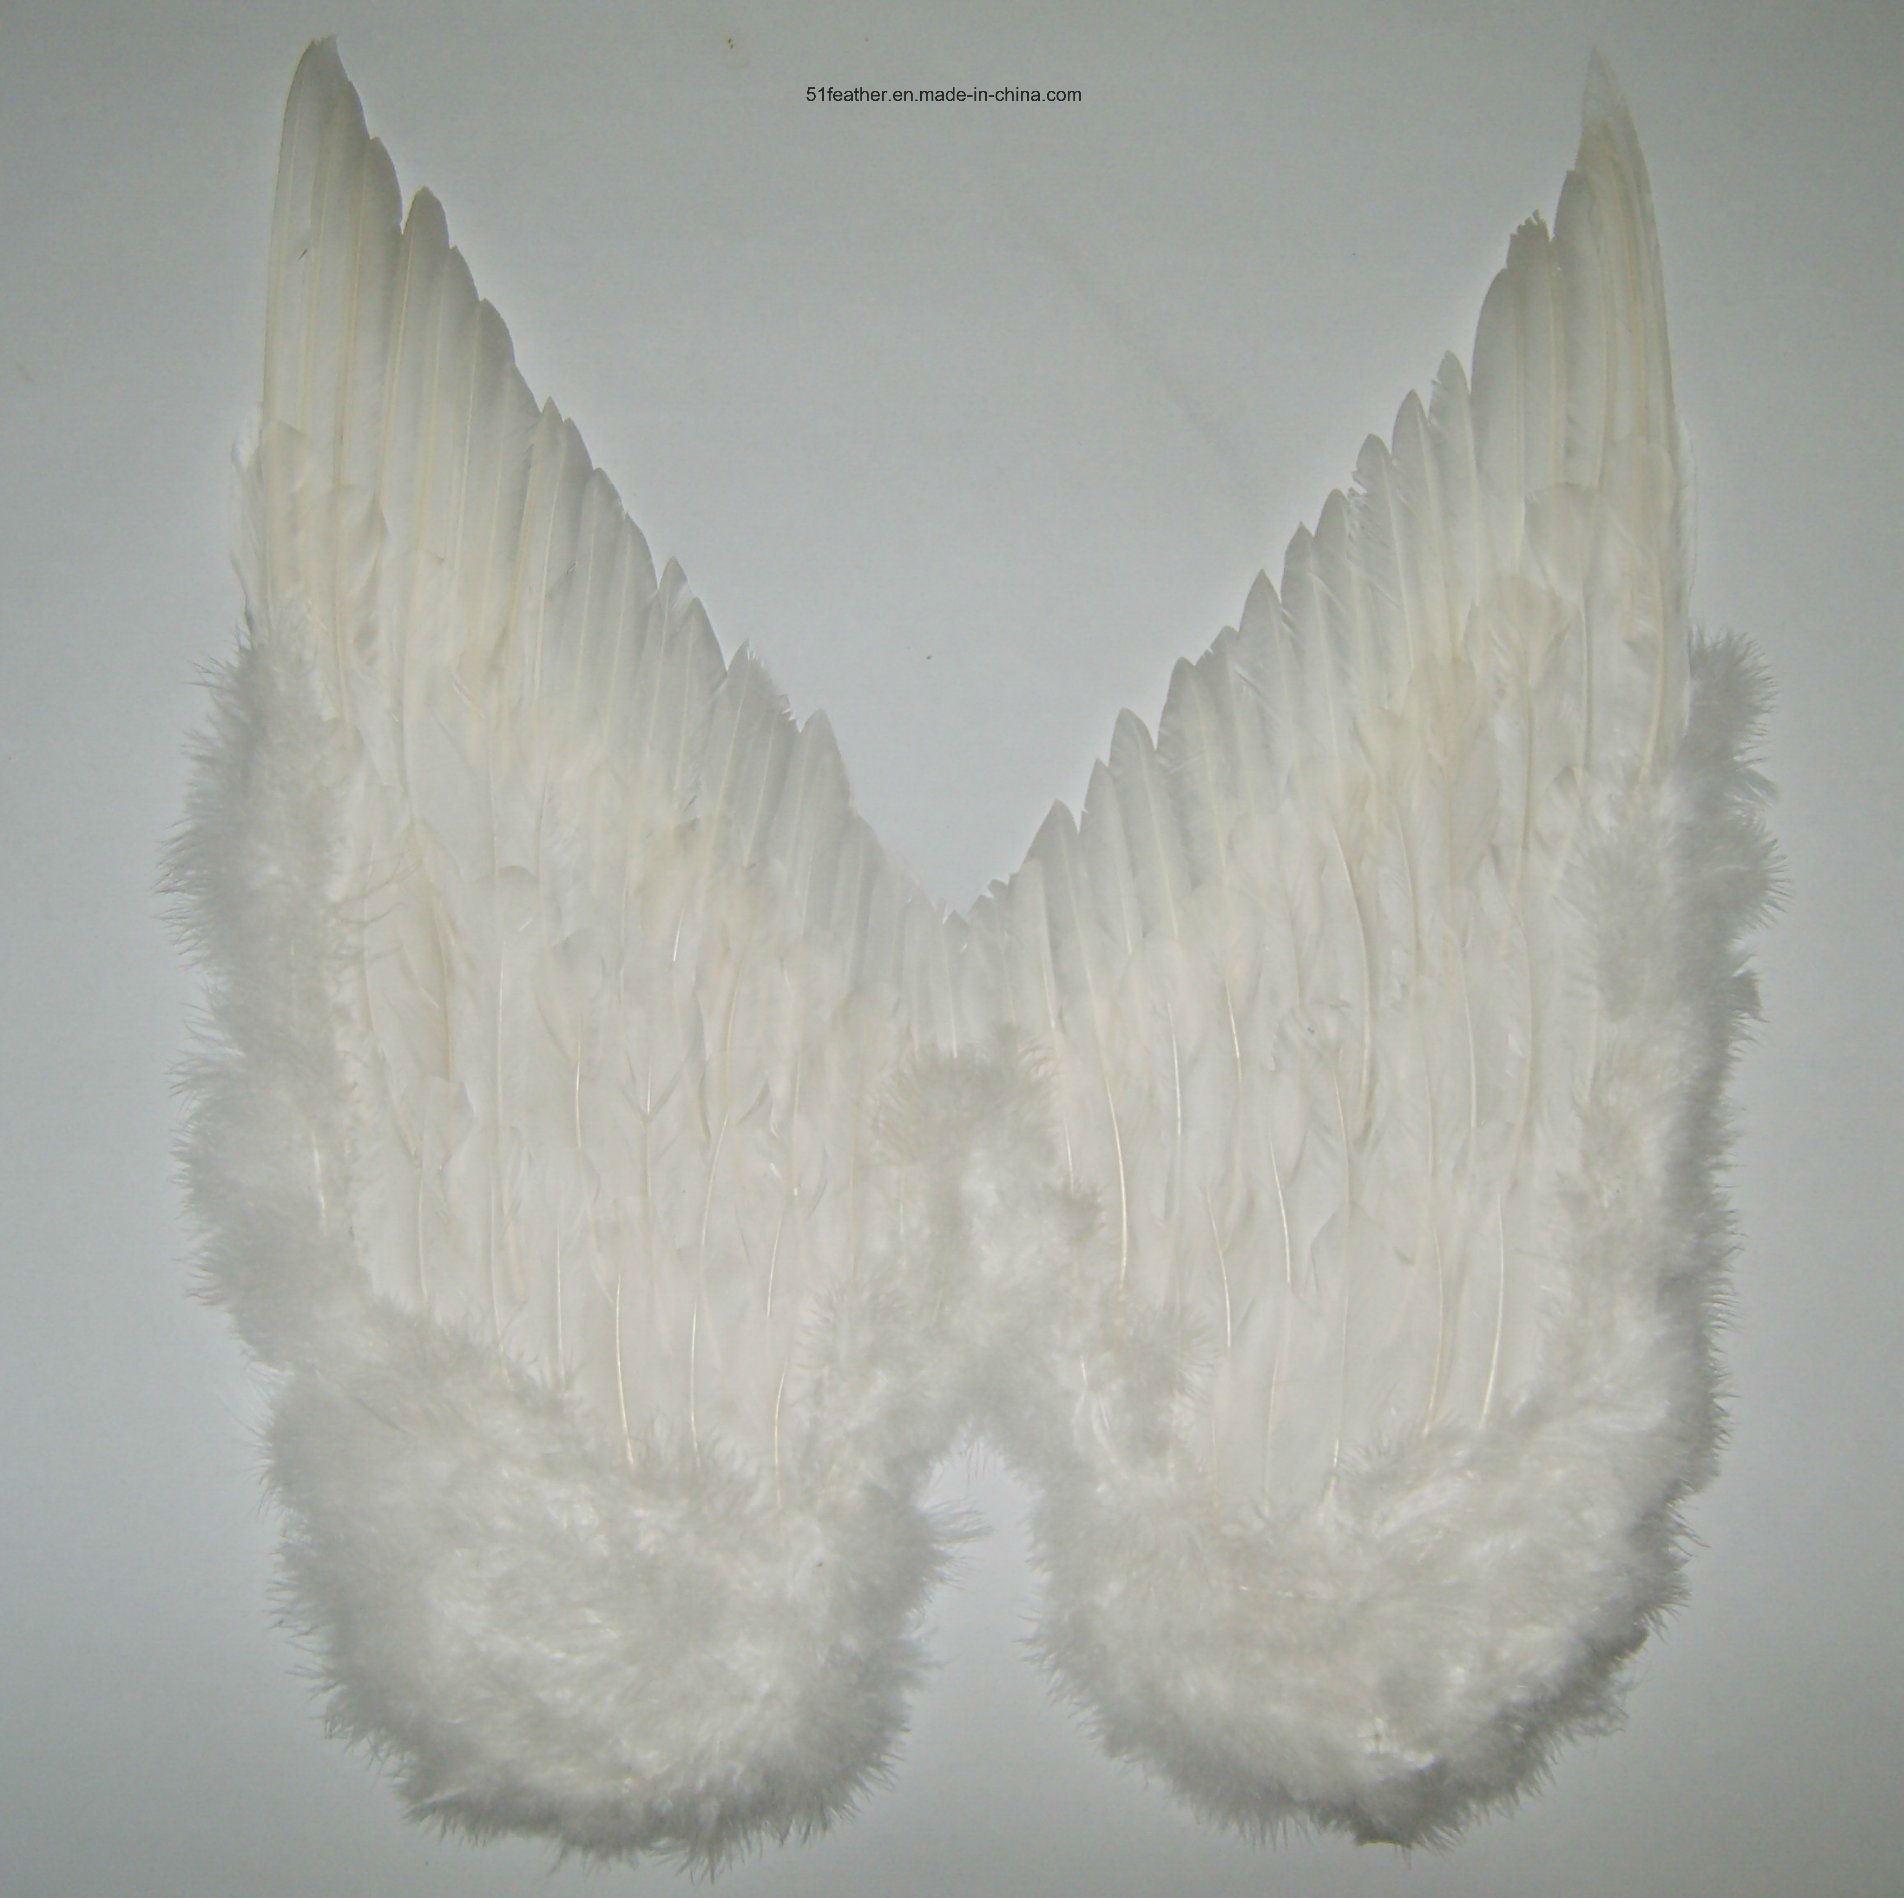 Handmade Amazing Feather Angel Wings